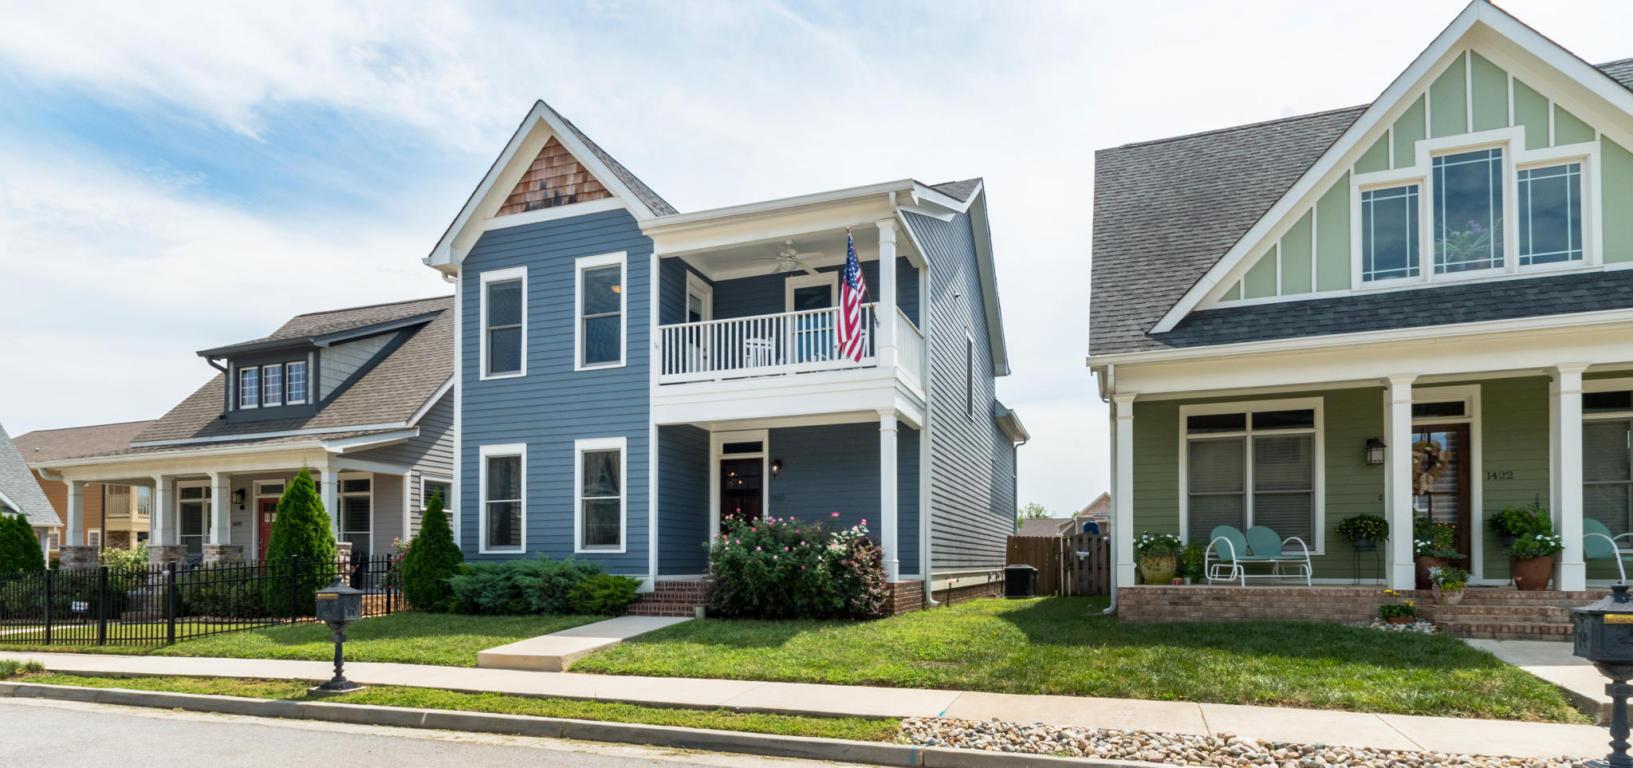 1410 Jefferson St, Chattanooga, TN 37408